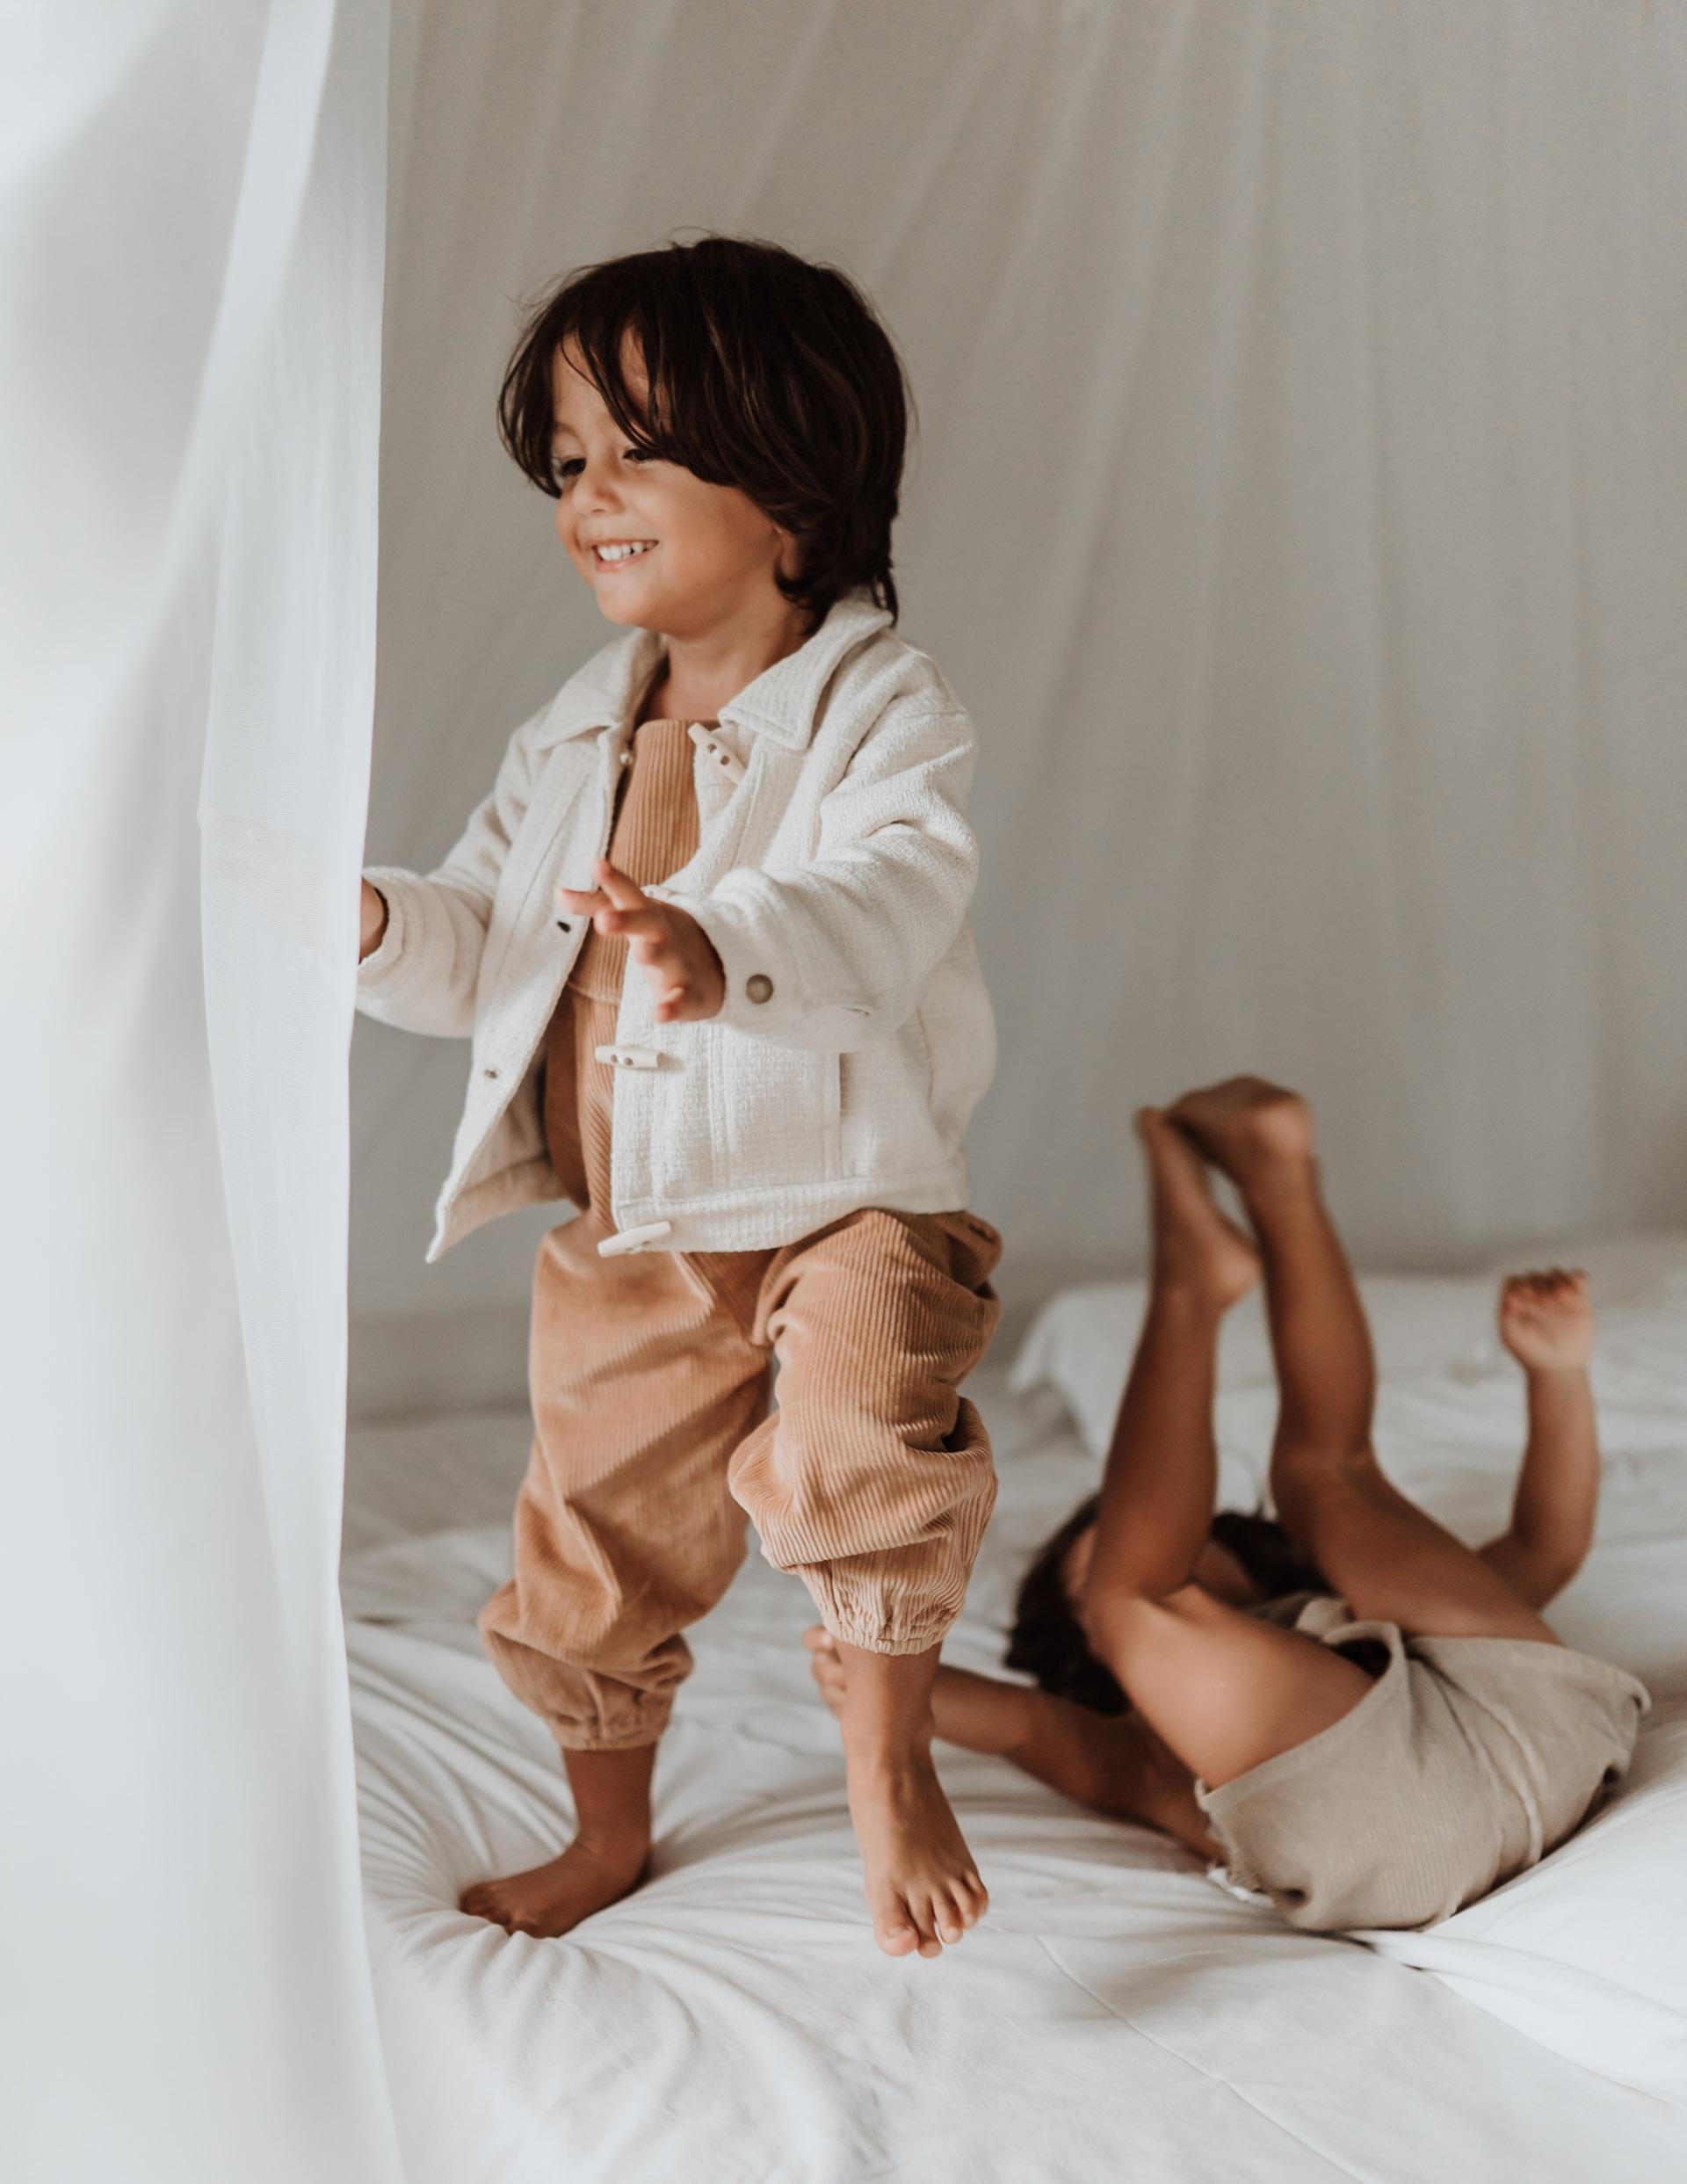 keira-mason-illoura-the-label-boys-playing-on-bed.jpg